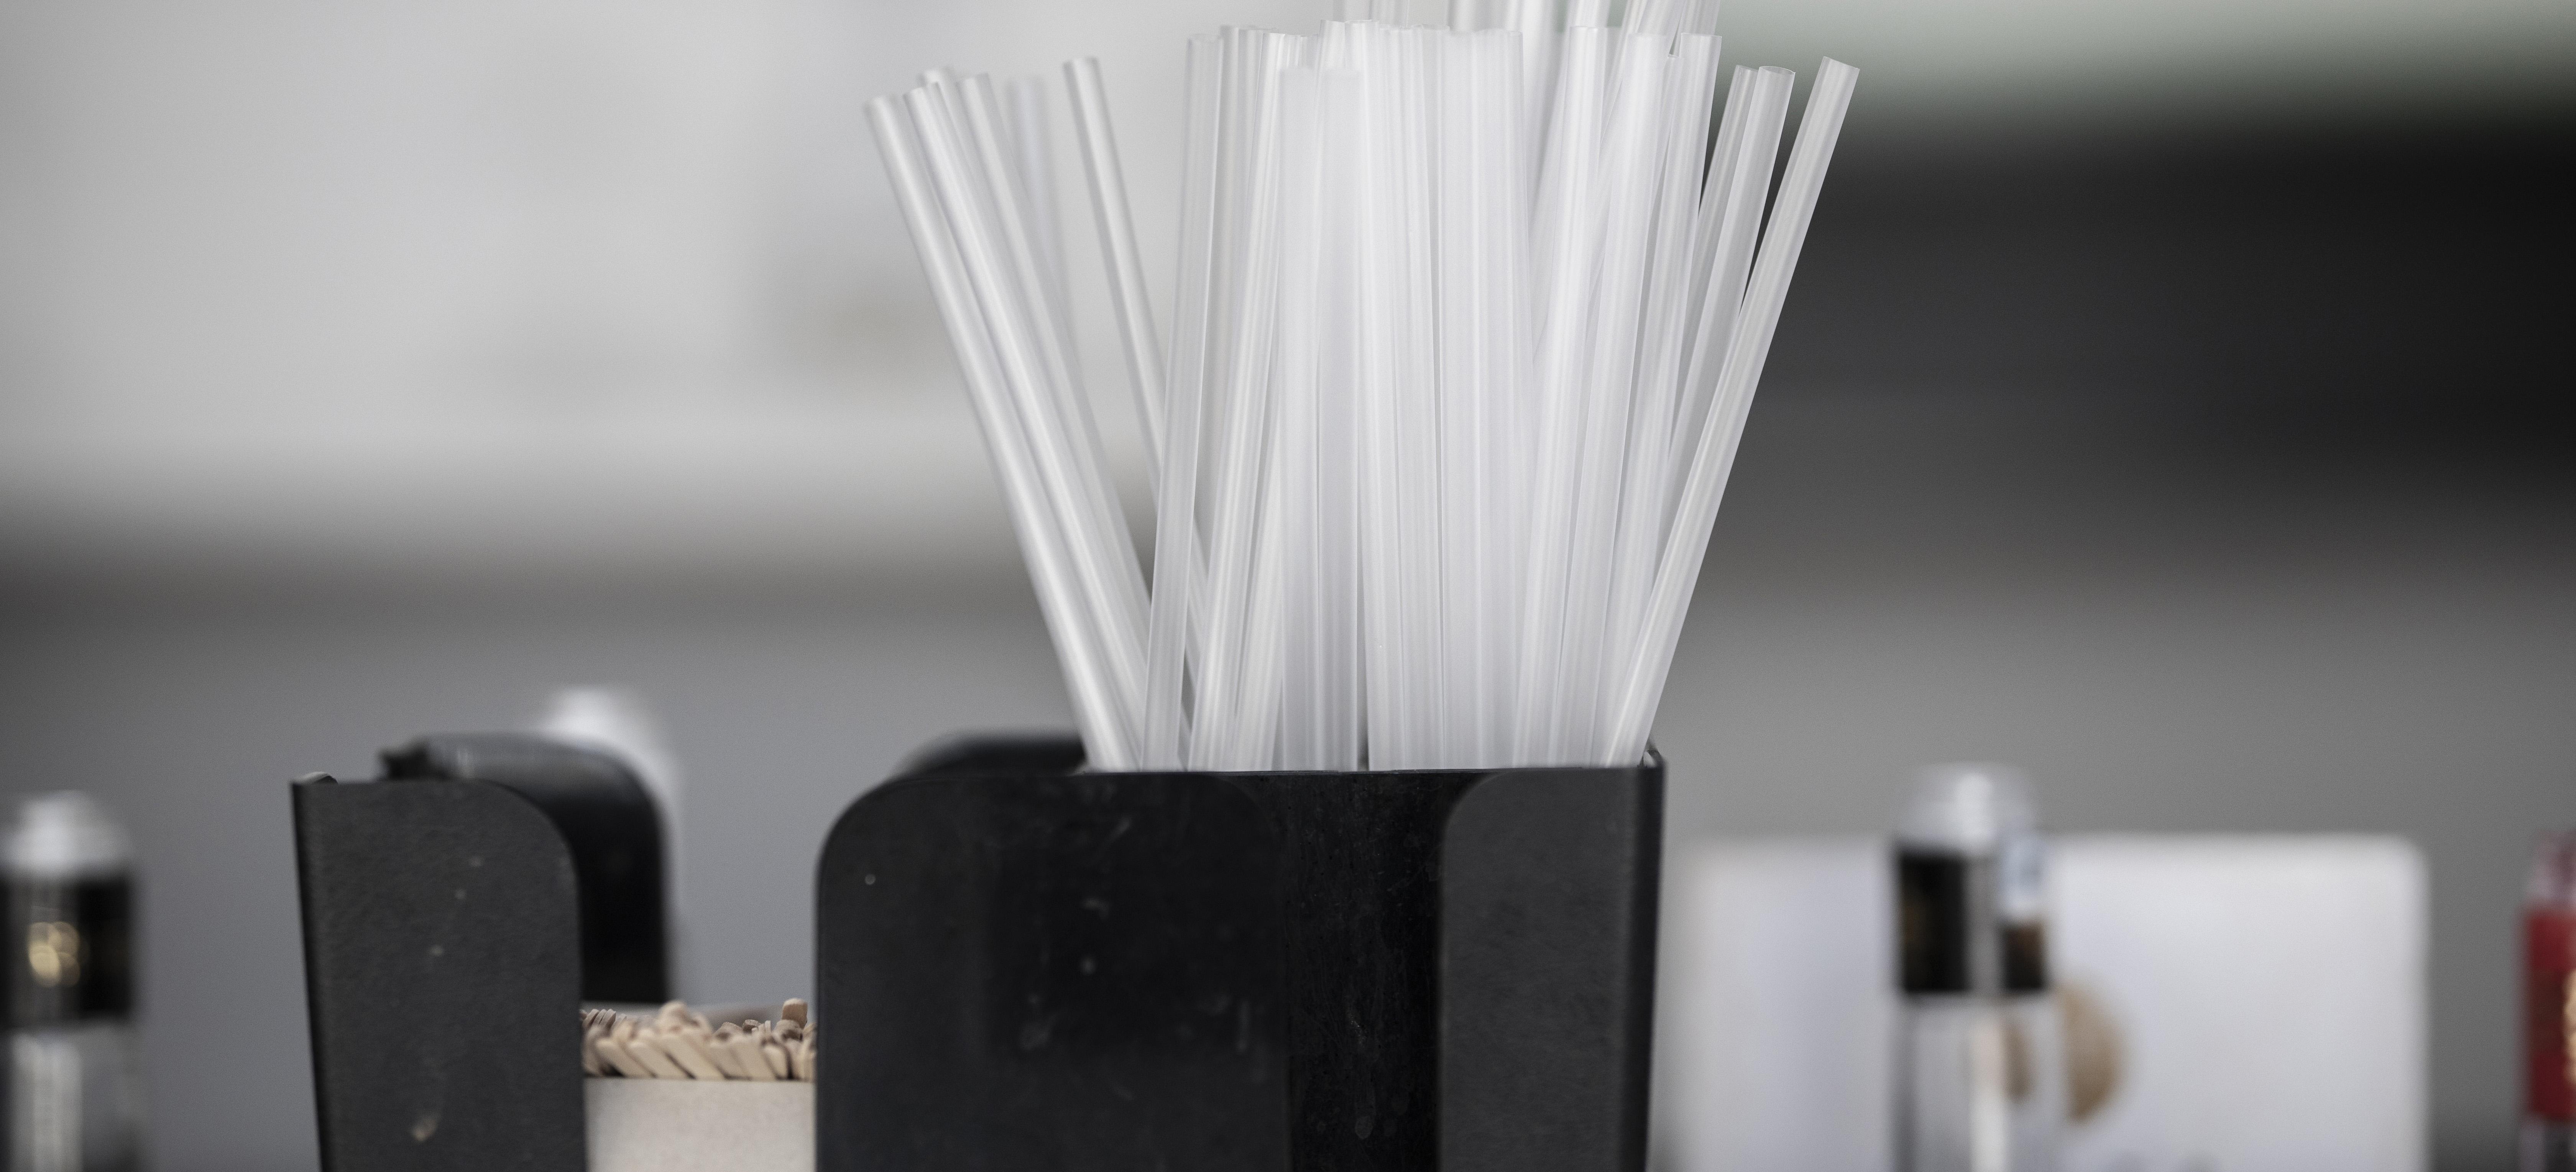 Plastic straws on a restaurant bar